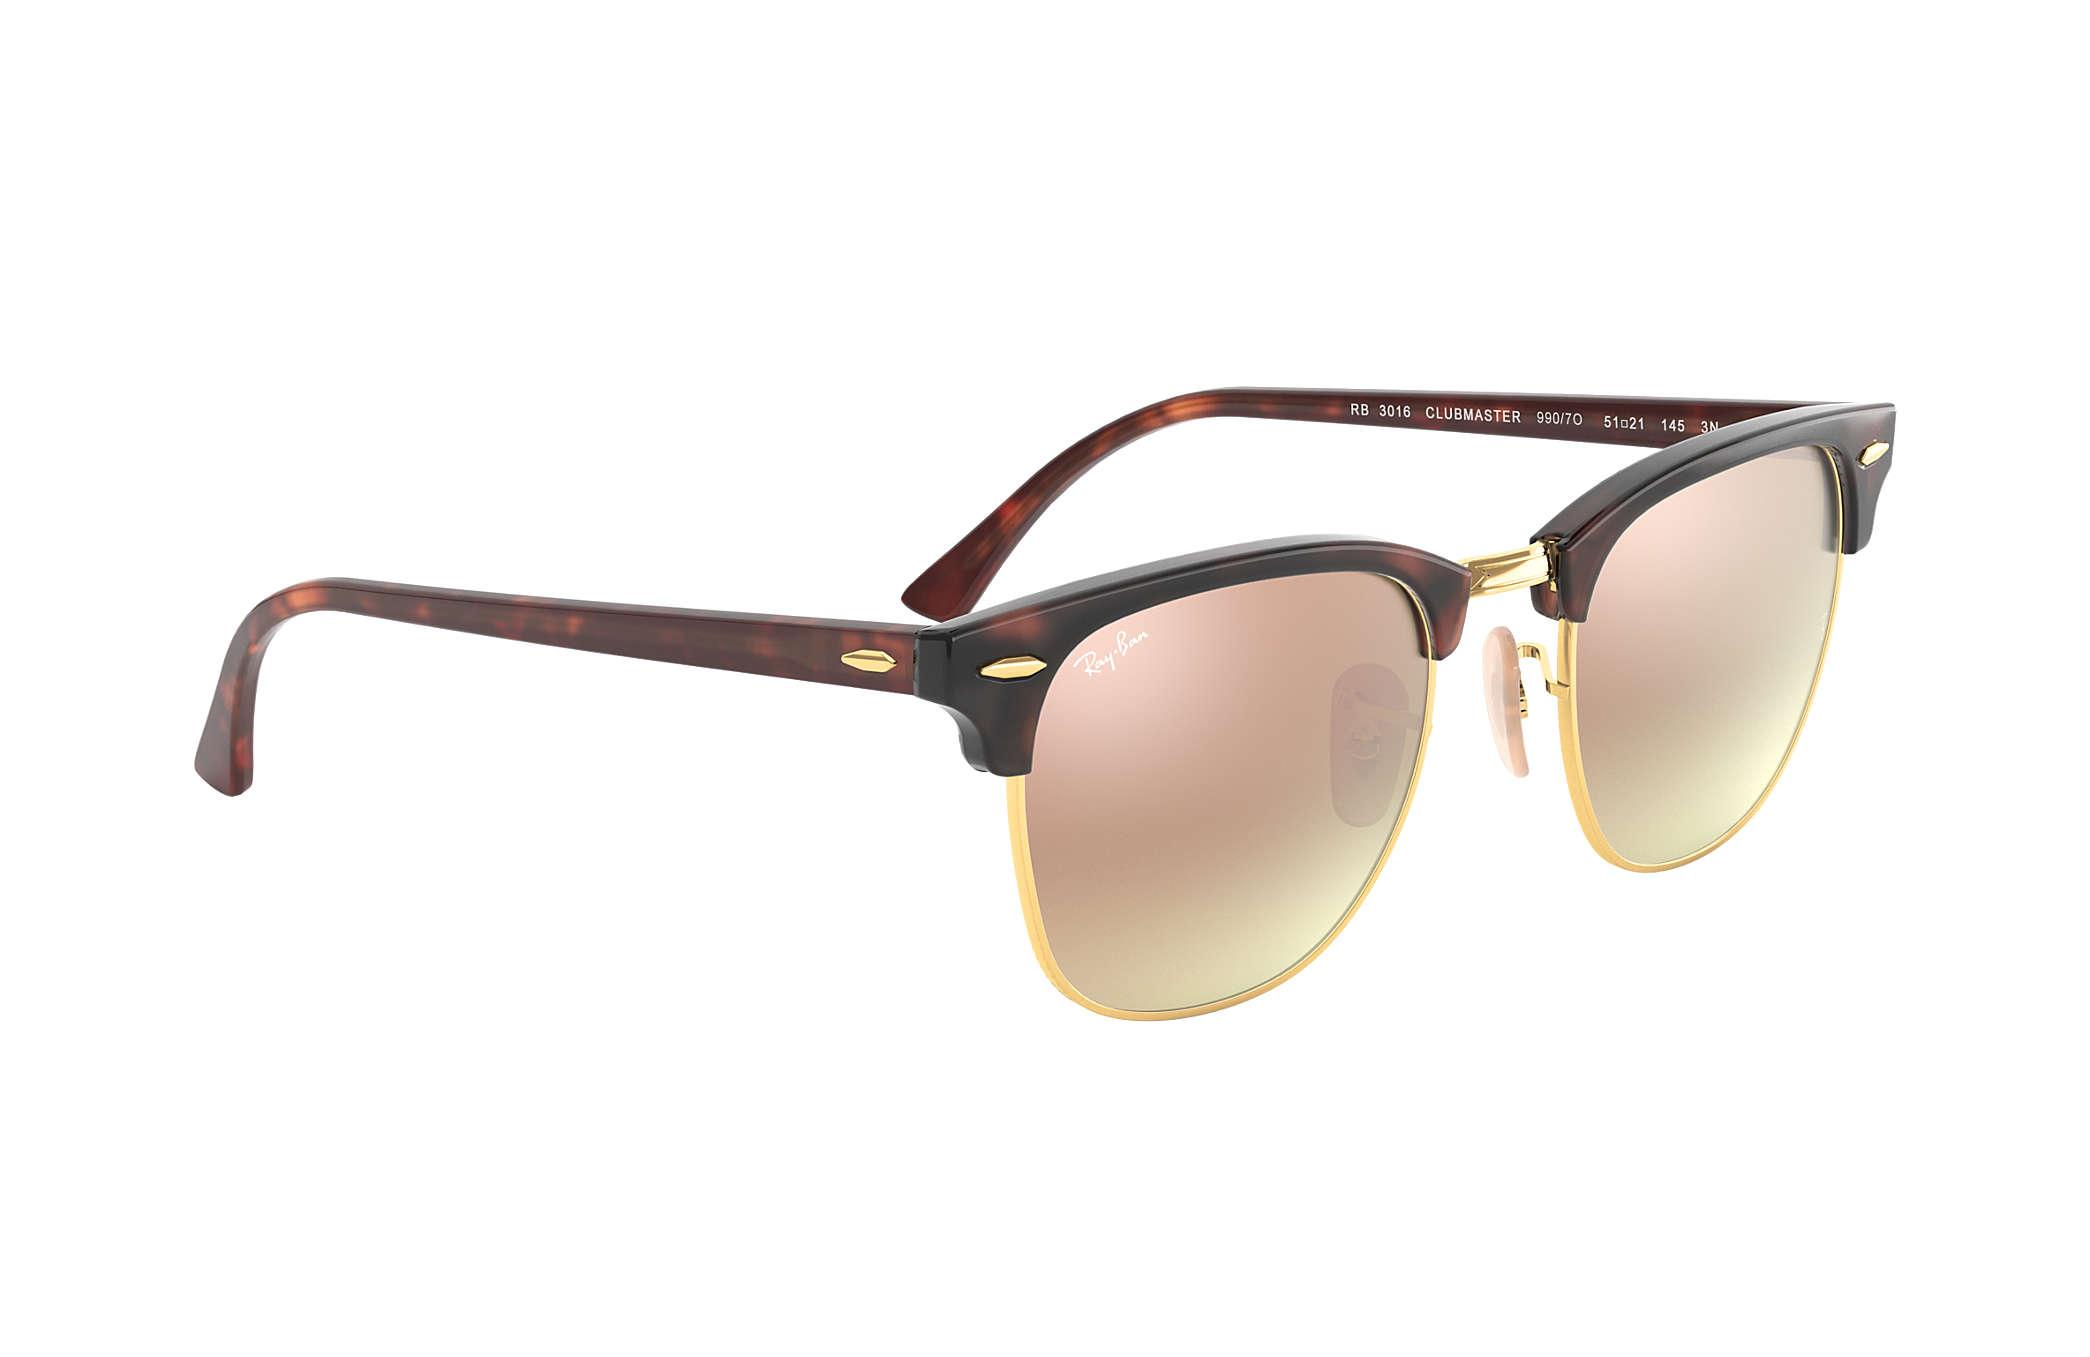 5c12e11d08 ... switzerland ray ban 0rb3016 clubmaster flash lenses gradient  tortoisegold tortoise sun aede2 9d515